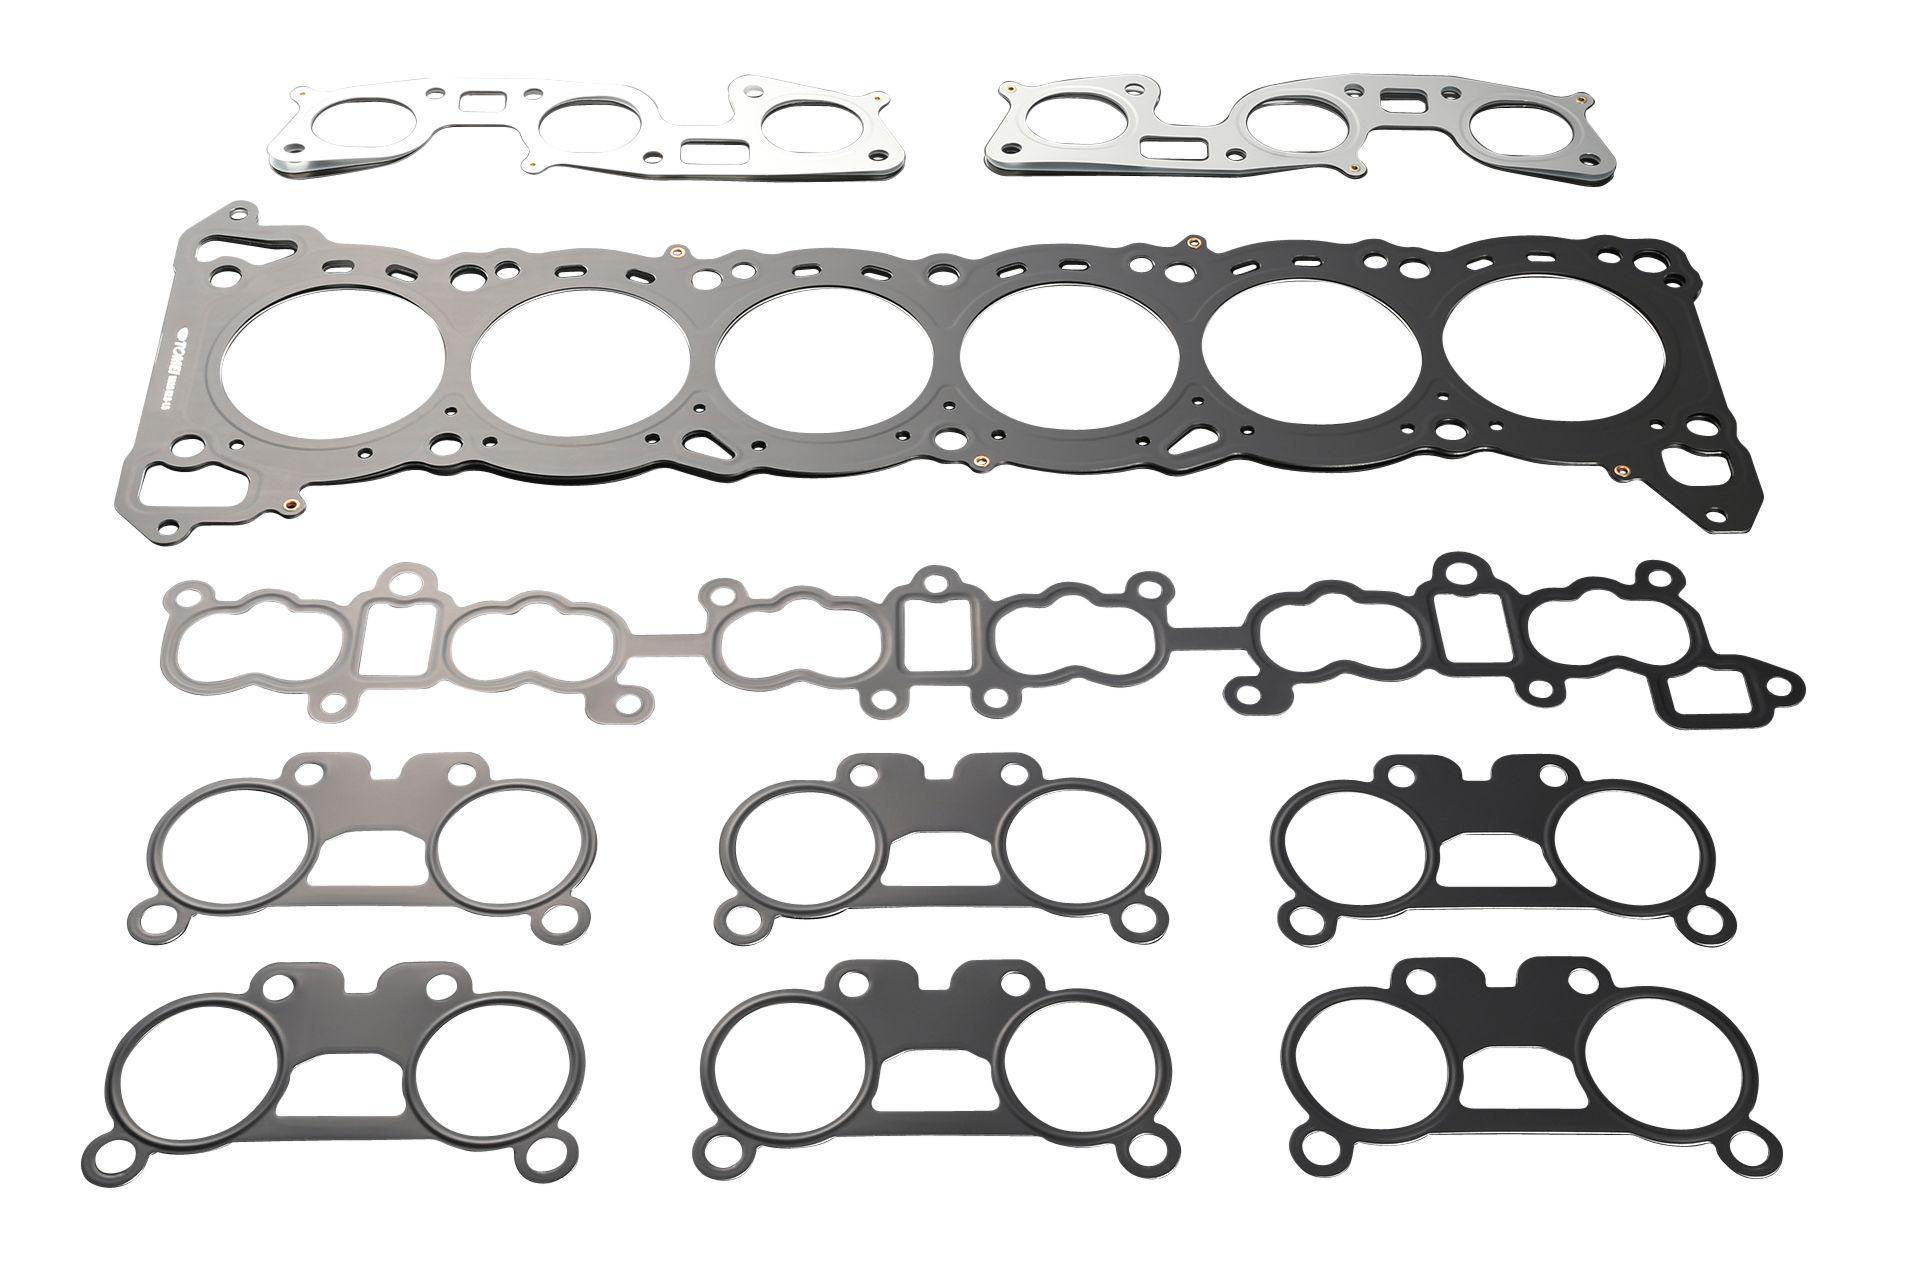 R32 Engine Gaskets Amp Gasket Kits